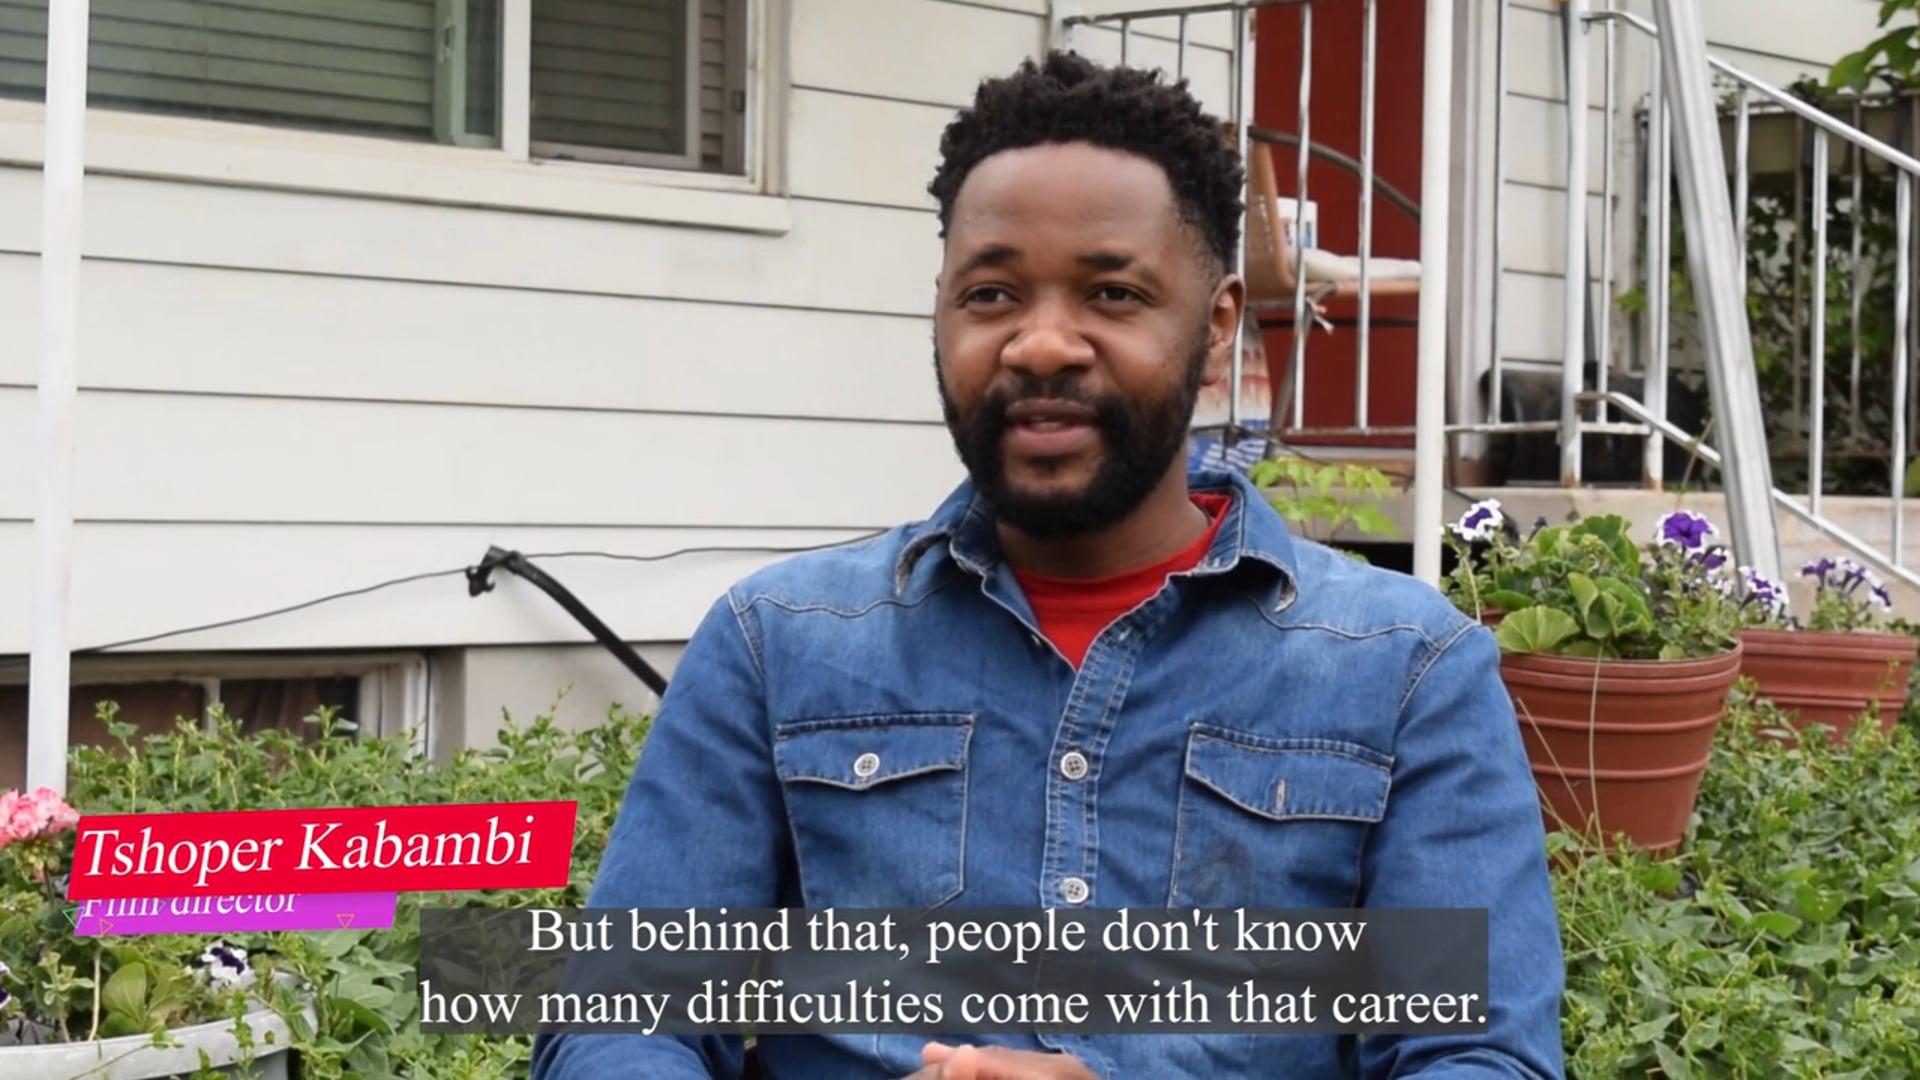 Tshoper Kabambi introduces his filmmaking work